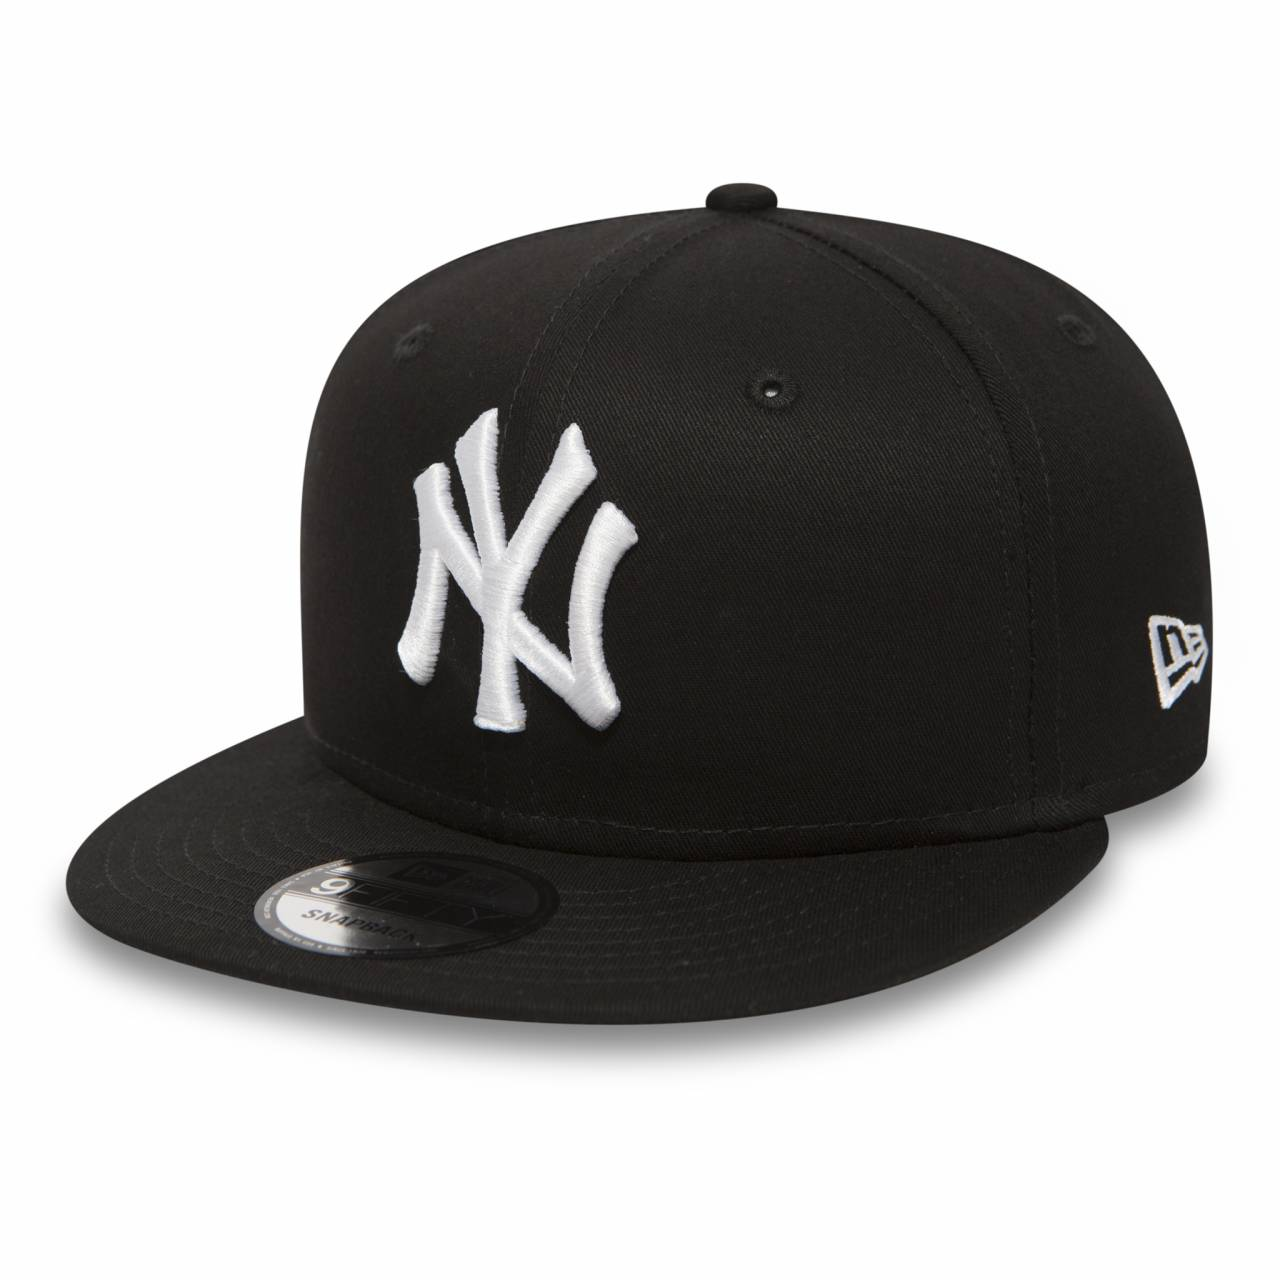 9FIFTY MLB NEW YORK YANKEES BLACK SNAPBACK11180833